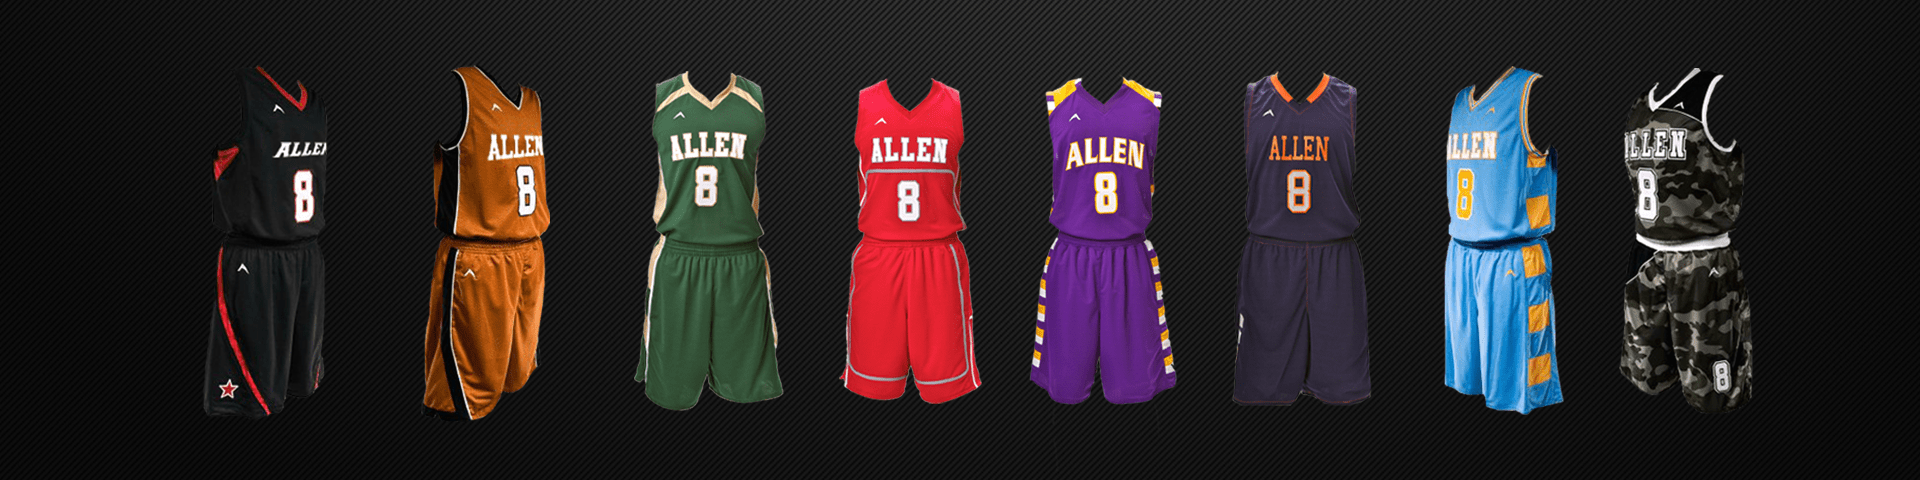 0b3bdb3c11e3 Custom Basketball Uniforms and Jerseys for Men